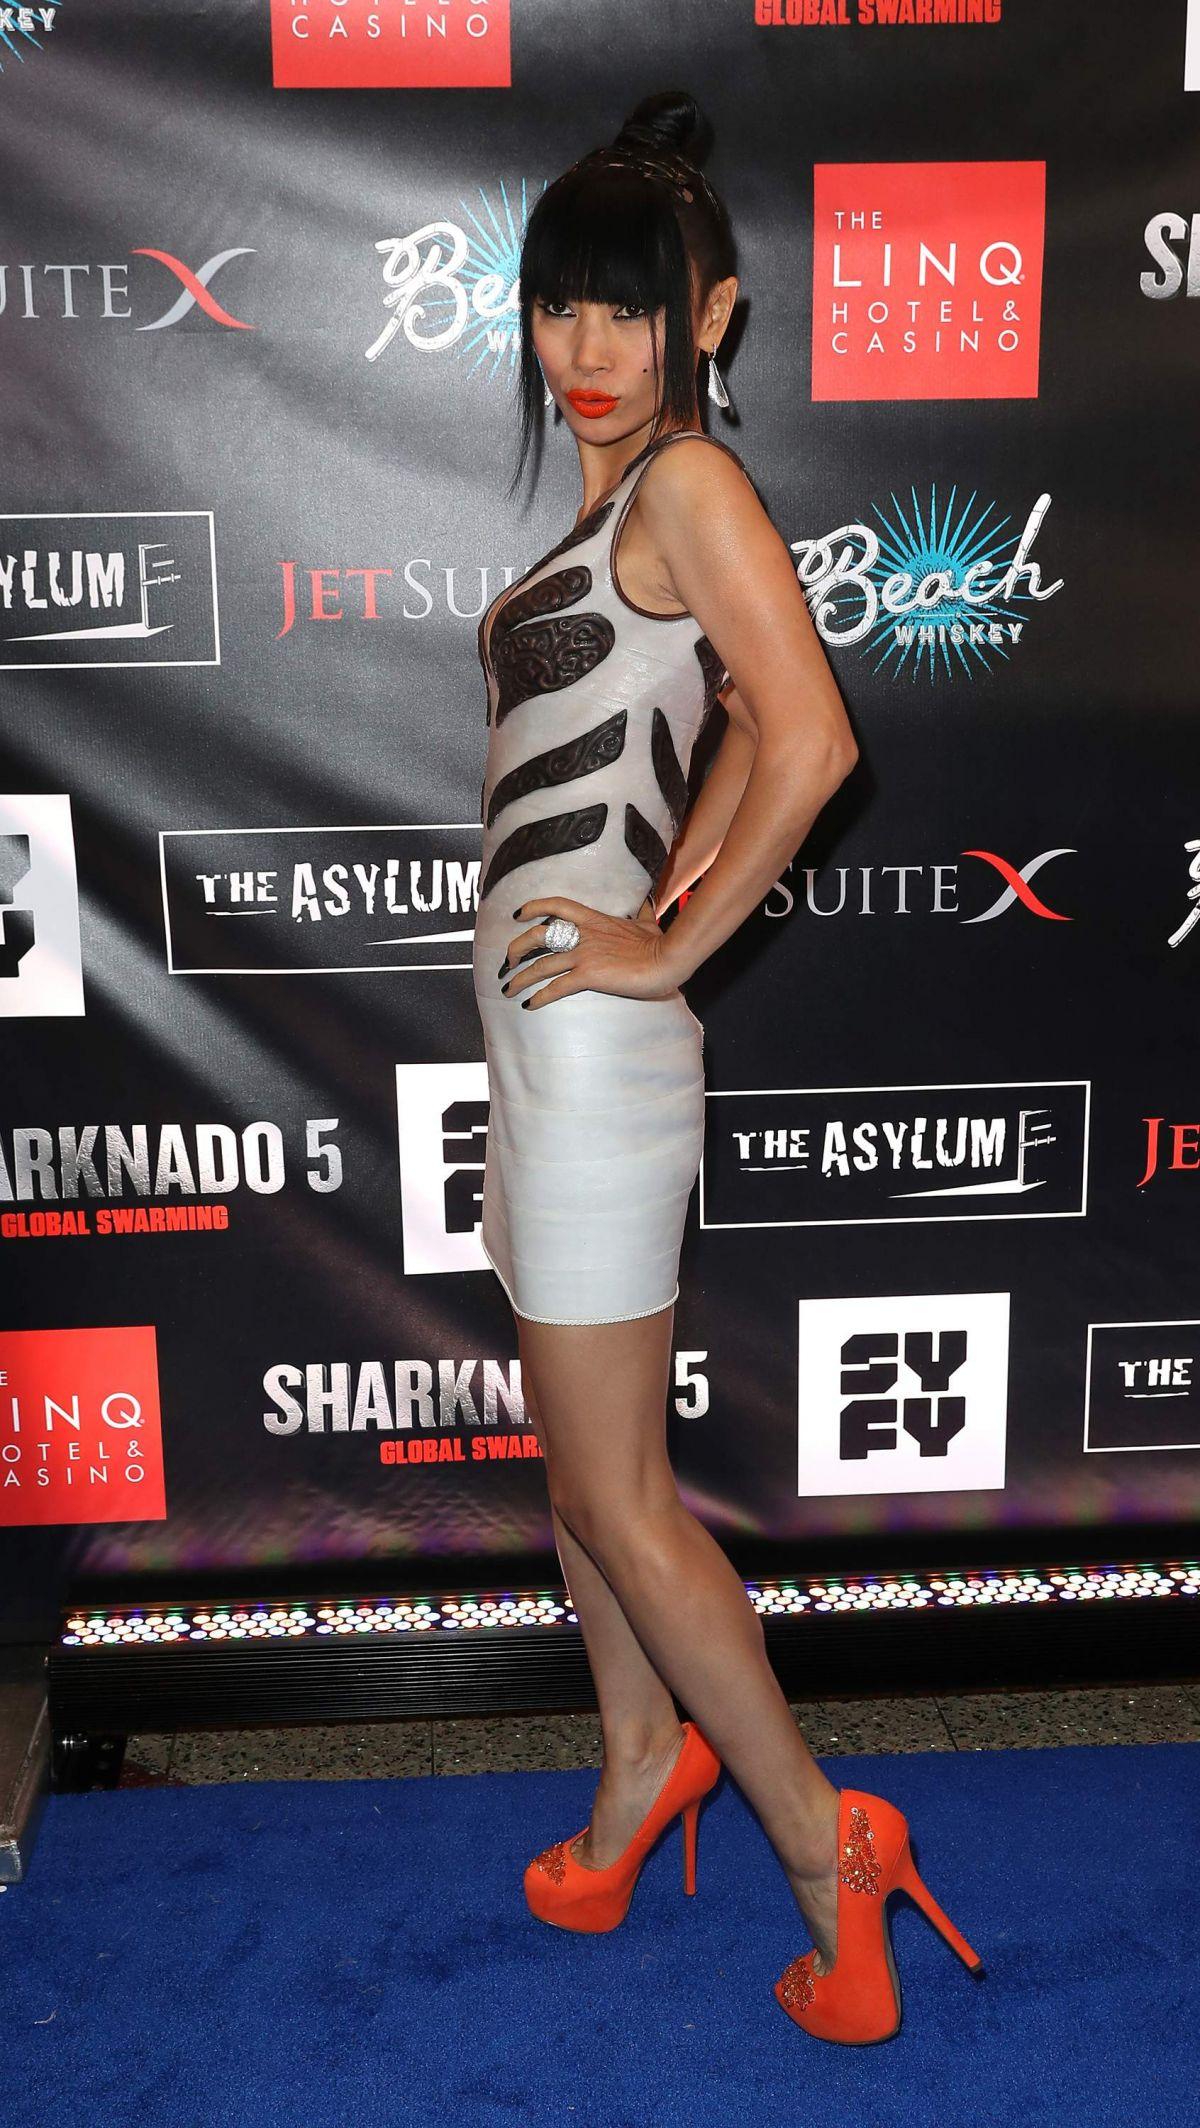 bai ling at sharknado 5  global swarming premiere in las vegas 08  06  2017